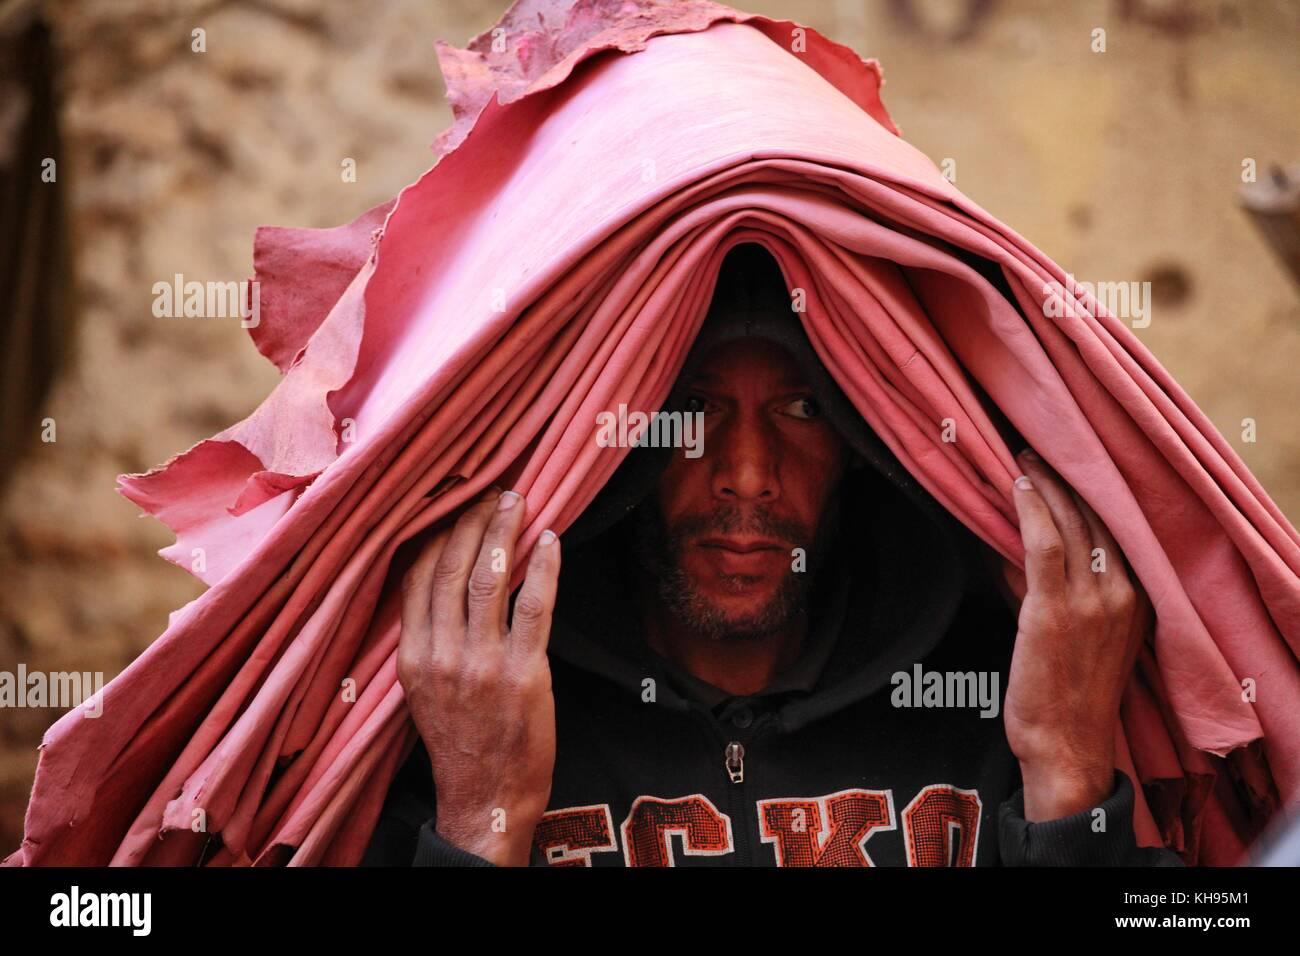 Fez, Morocco - November 8, 2017: Man holding freshly pink tanned animal skin at the Fez medina leather market - Stock Image